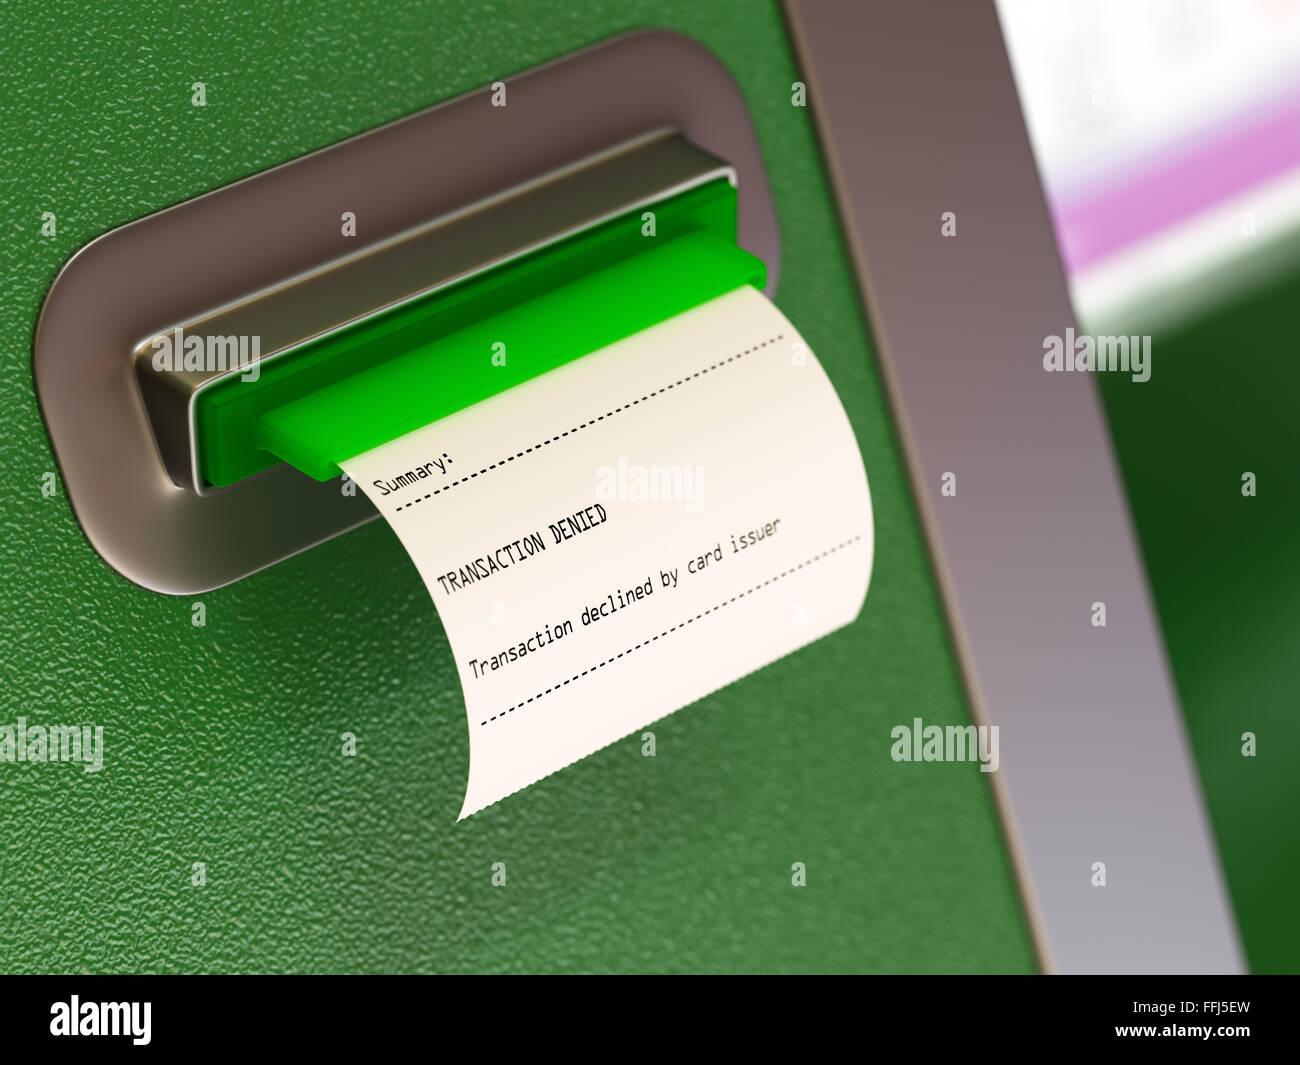 Transaction denied atm machine receipt Stock Photo: 95671153